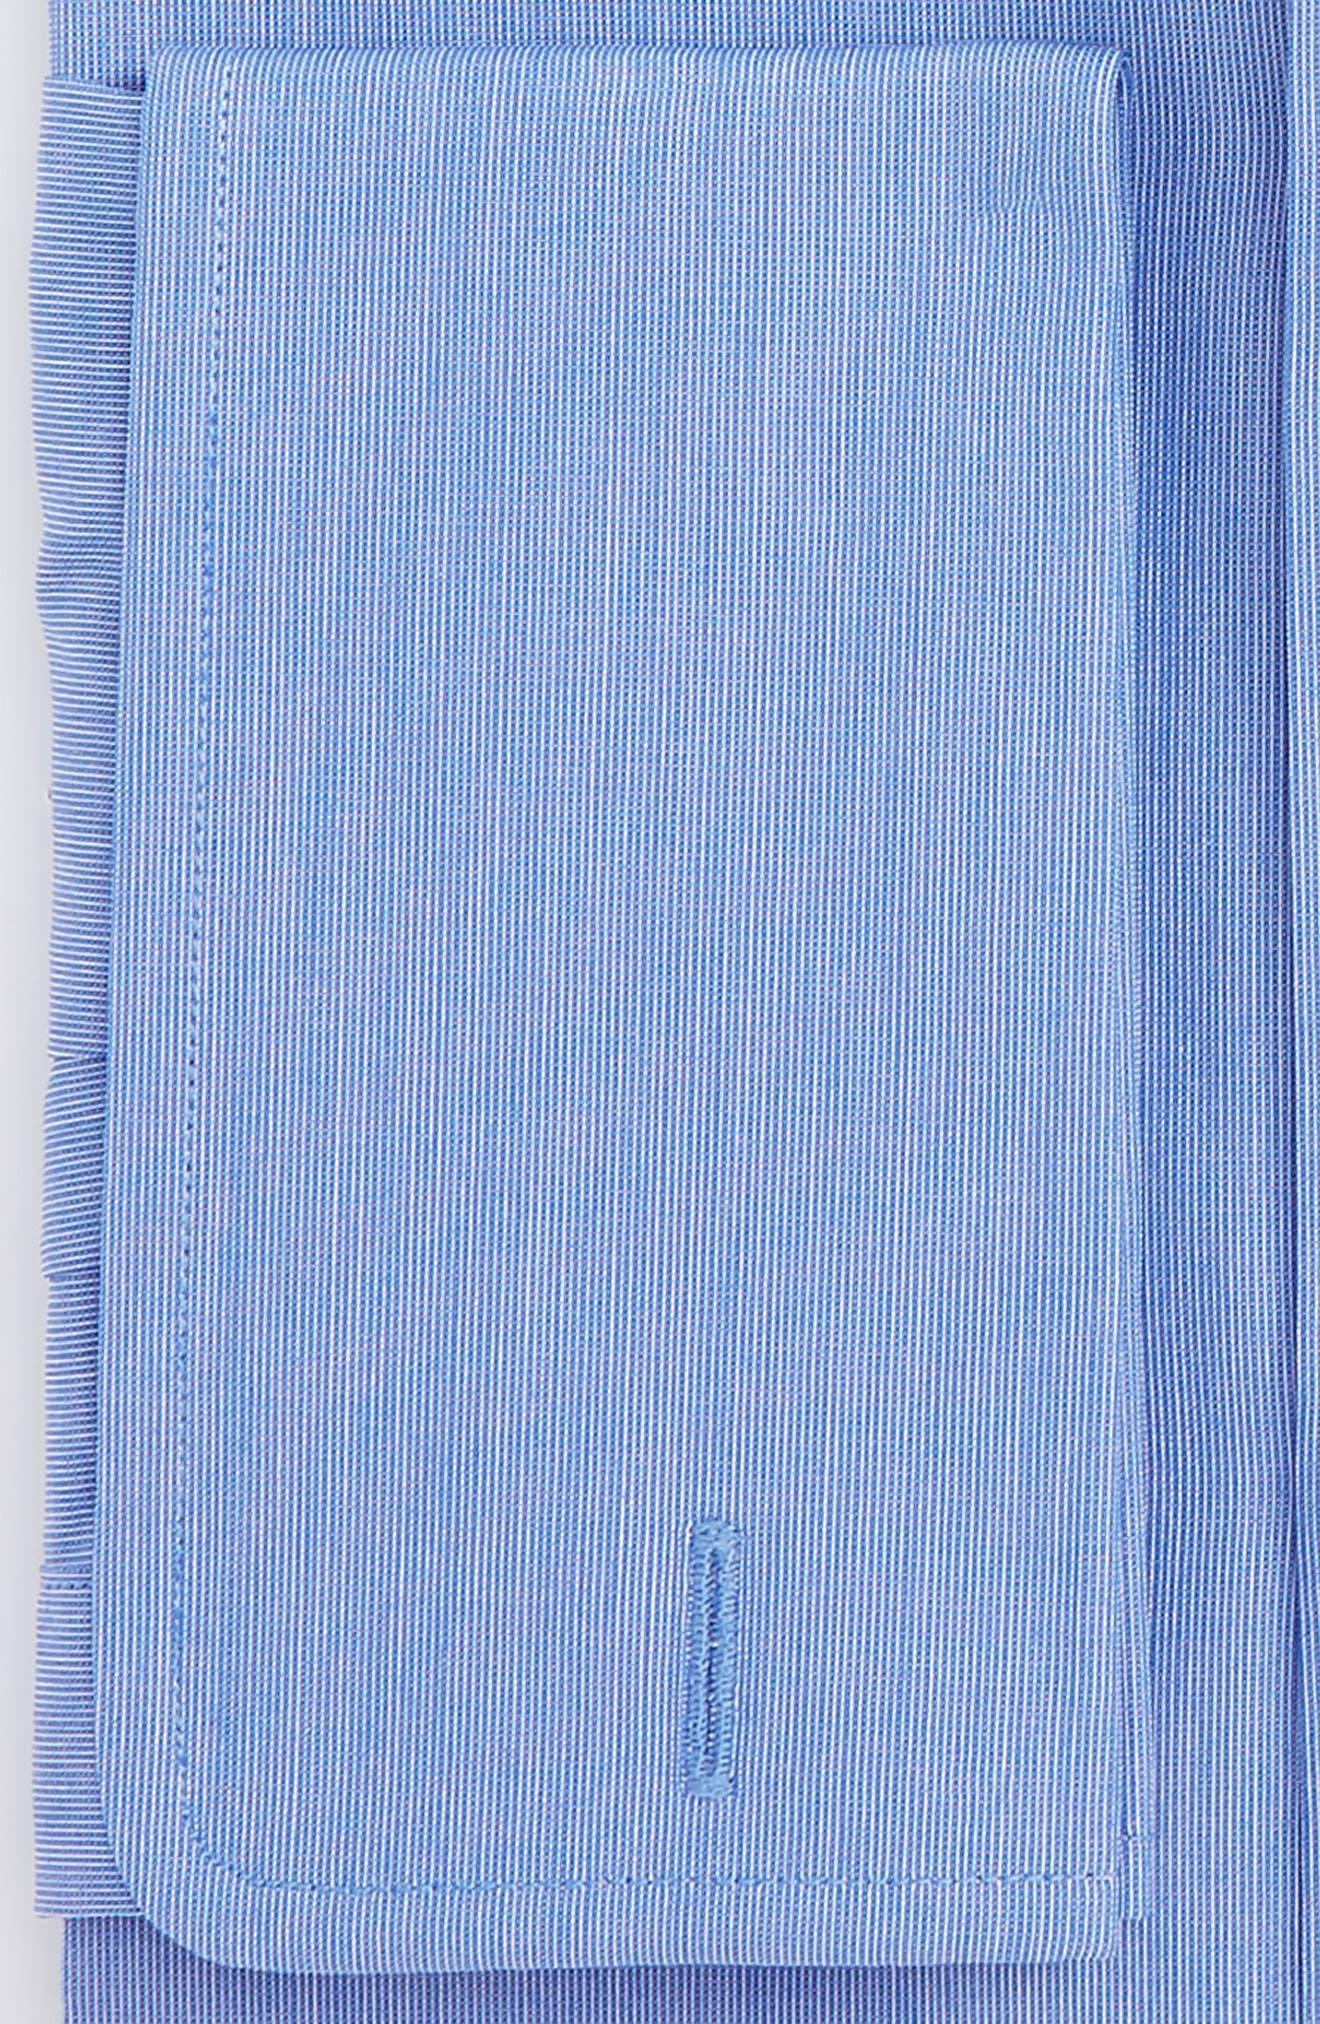 Regular Fit Solid Dress Shirt,                             Alternate thumbnail 2, color,                             Blue